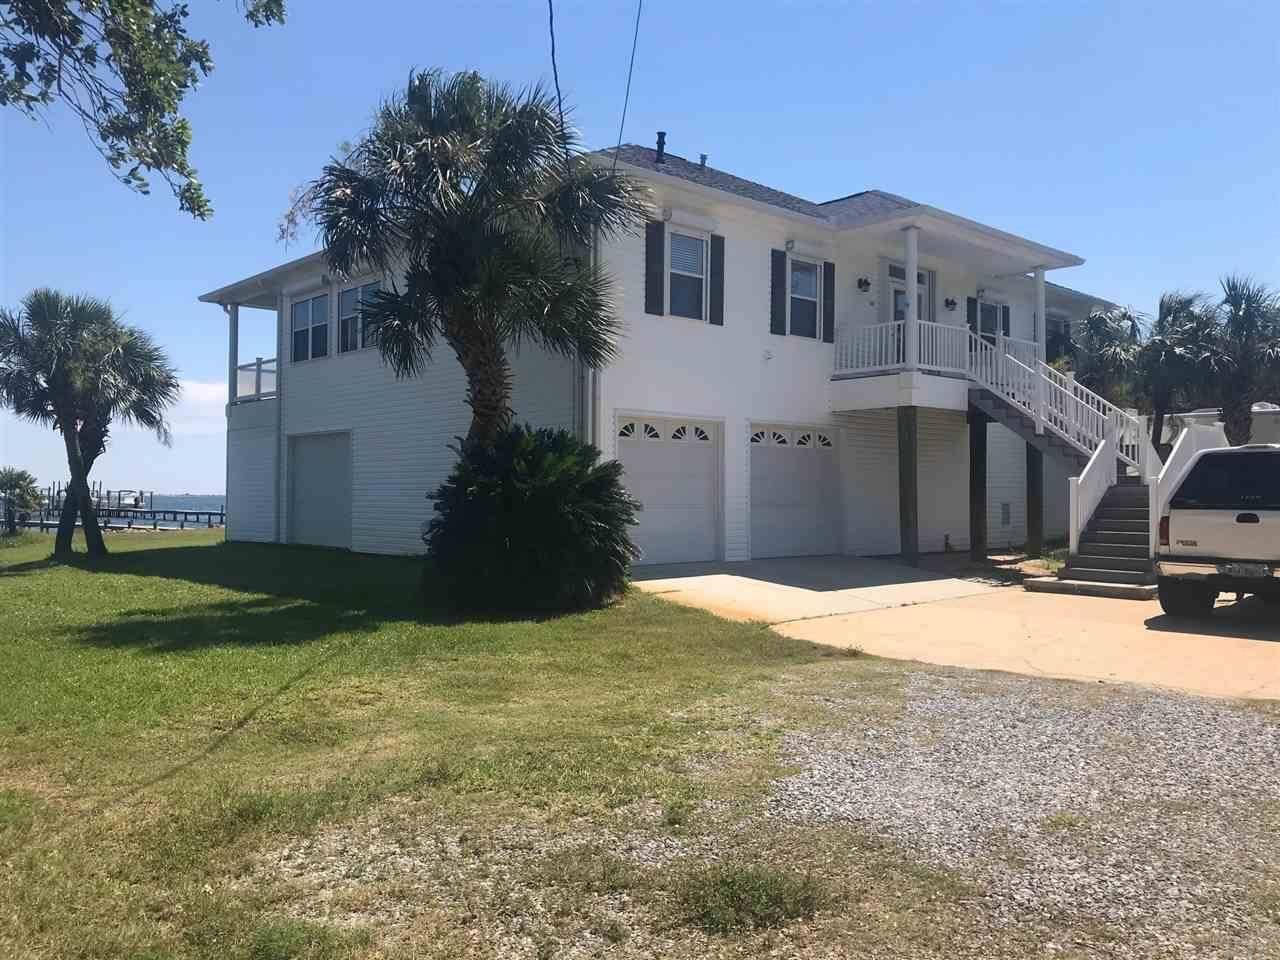 Property Image Of 4881 Soundside Dr In Gulf Breeze, Fl